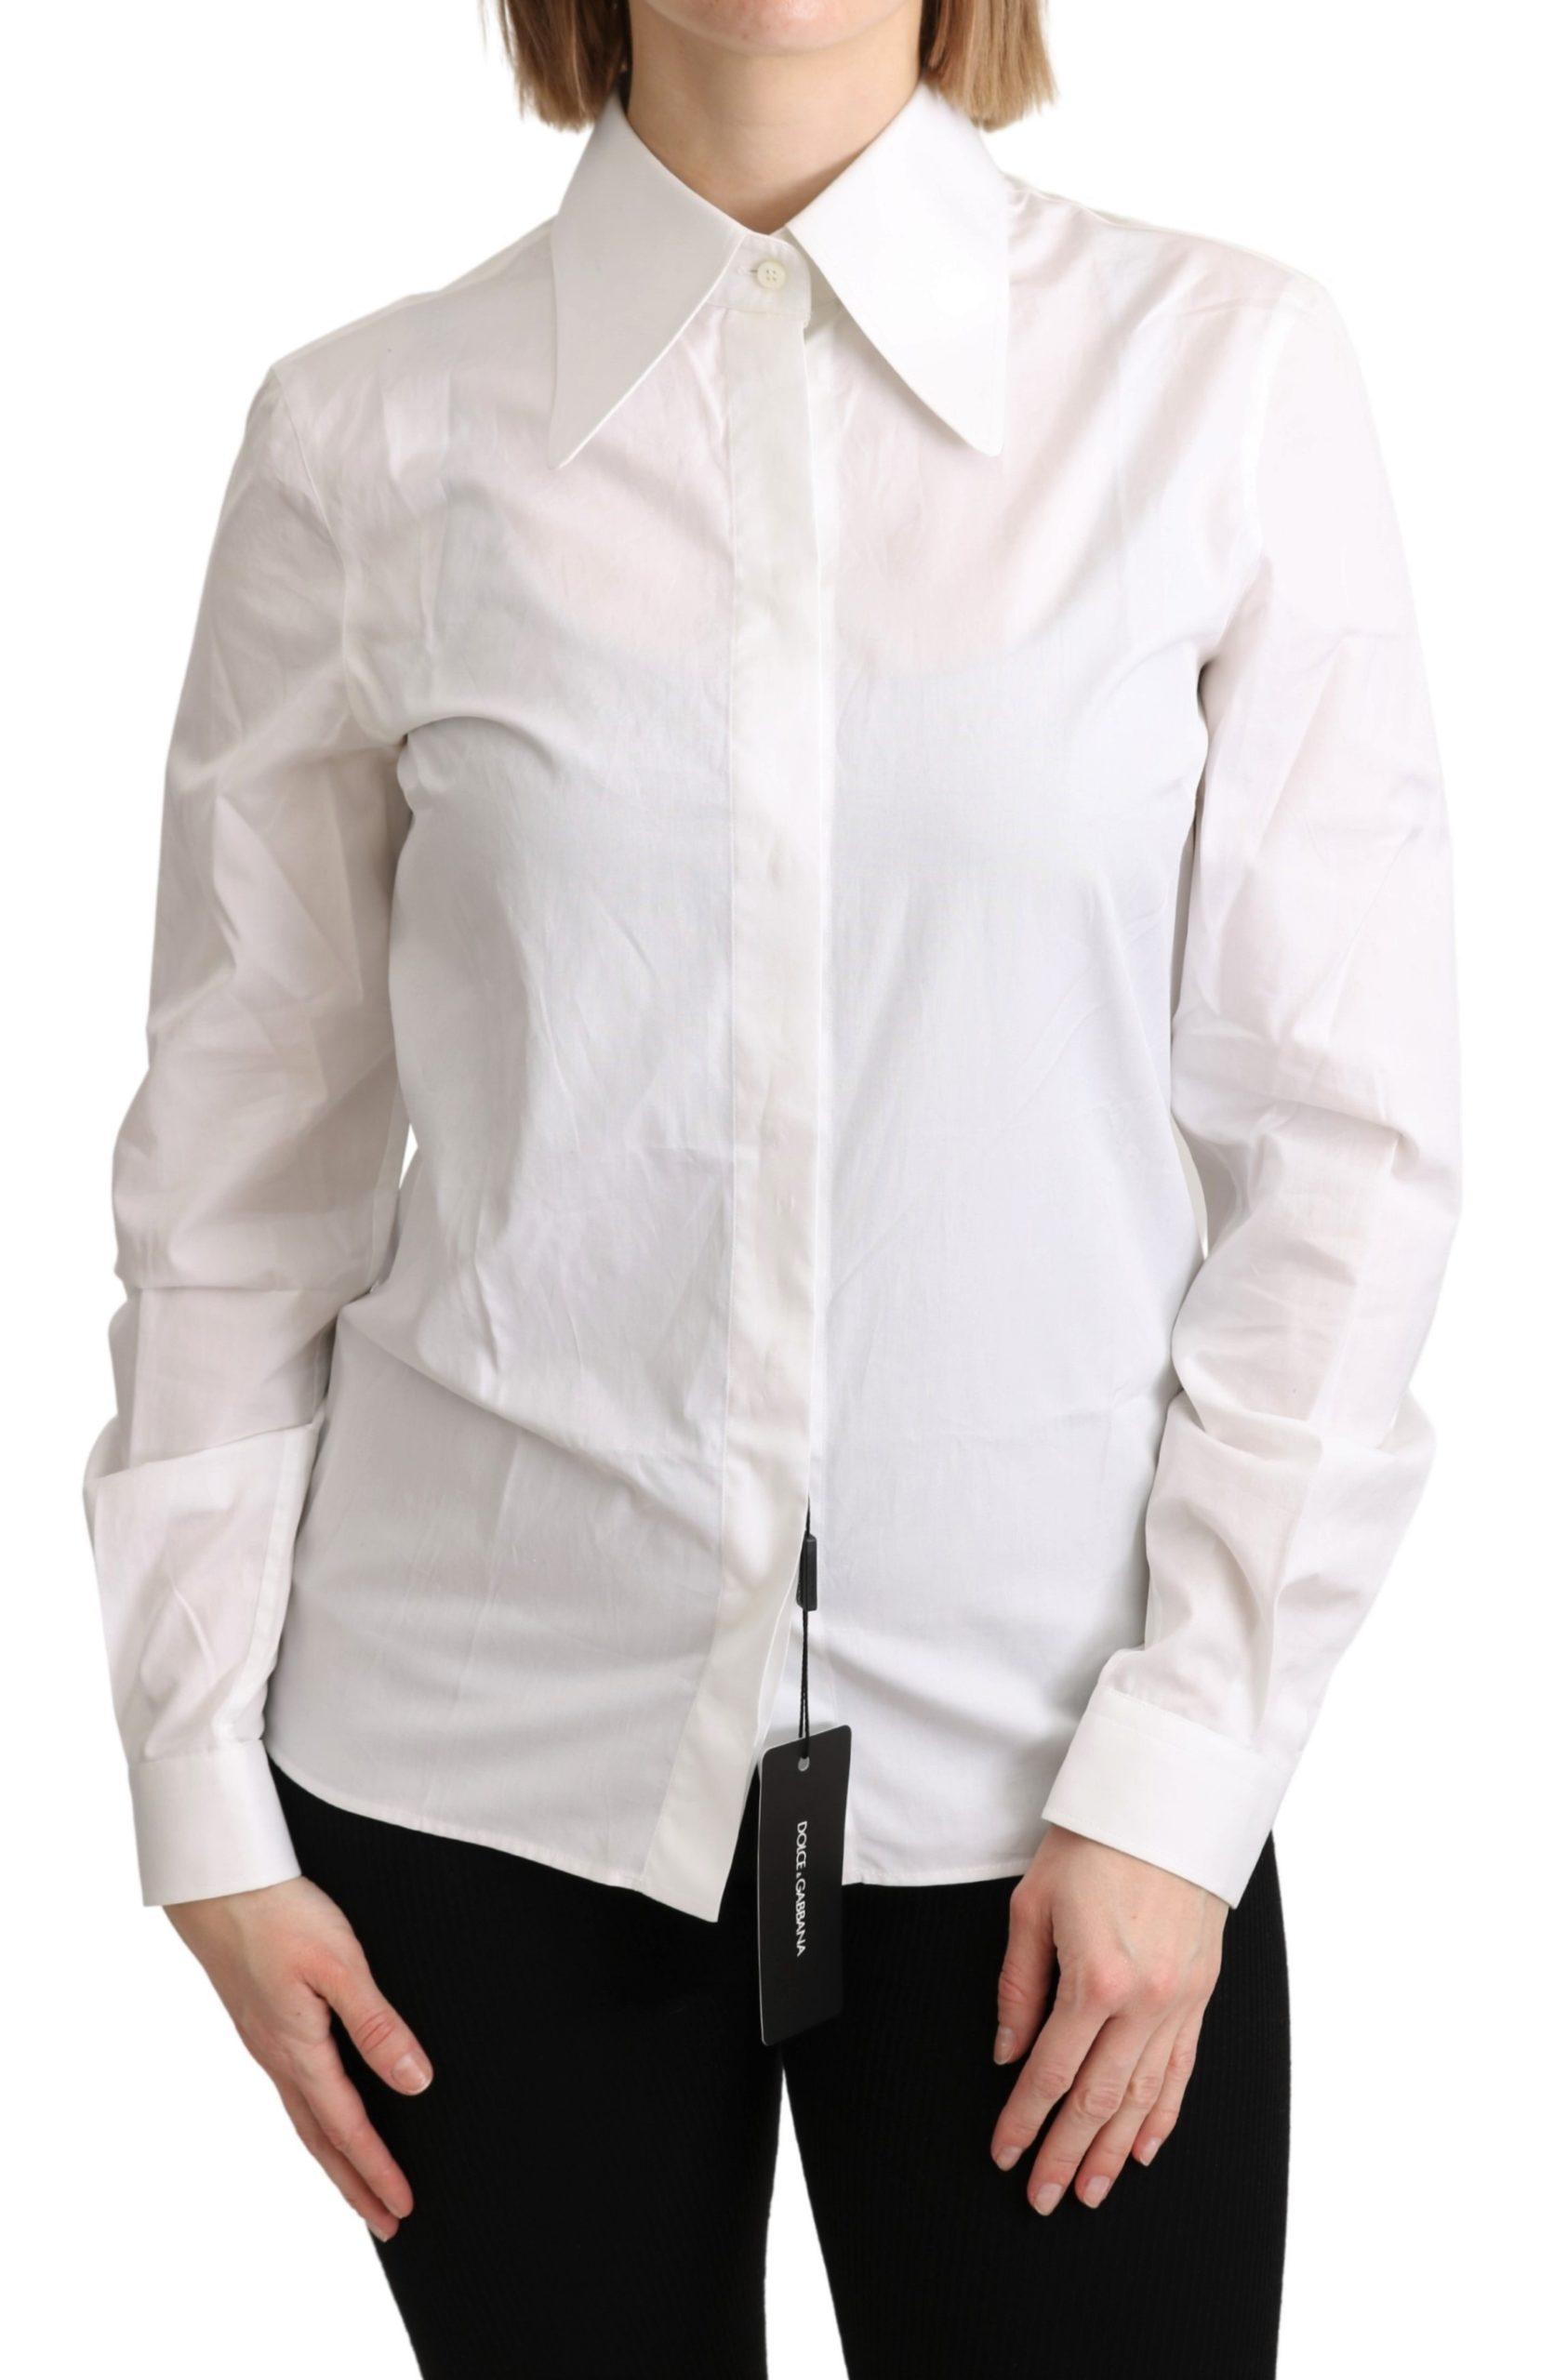 Dolce & Gabbana Women's Collared Formal Dress White TSH5057 - IT40|S